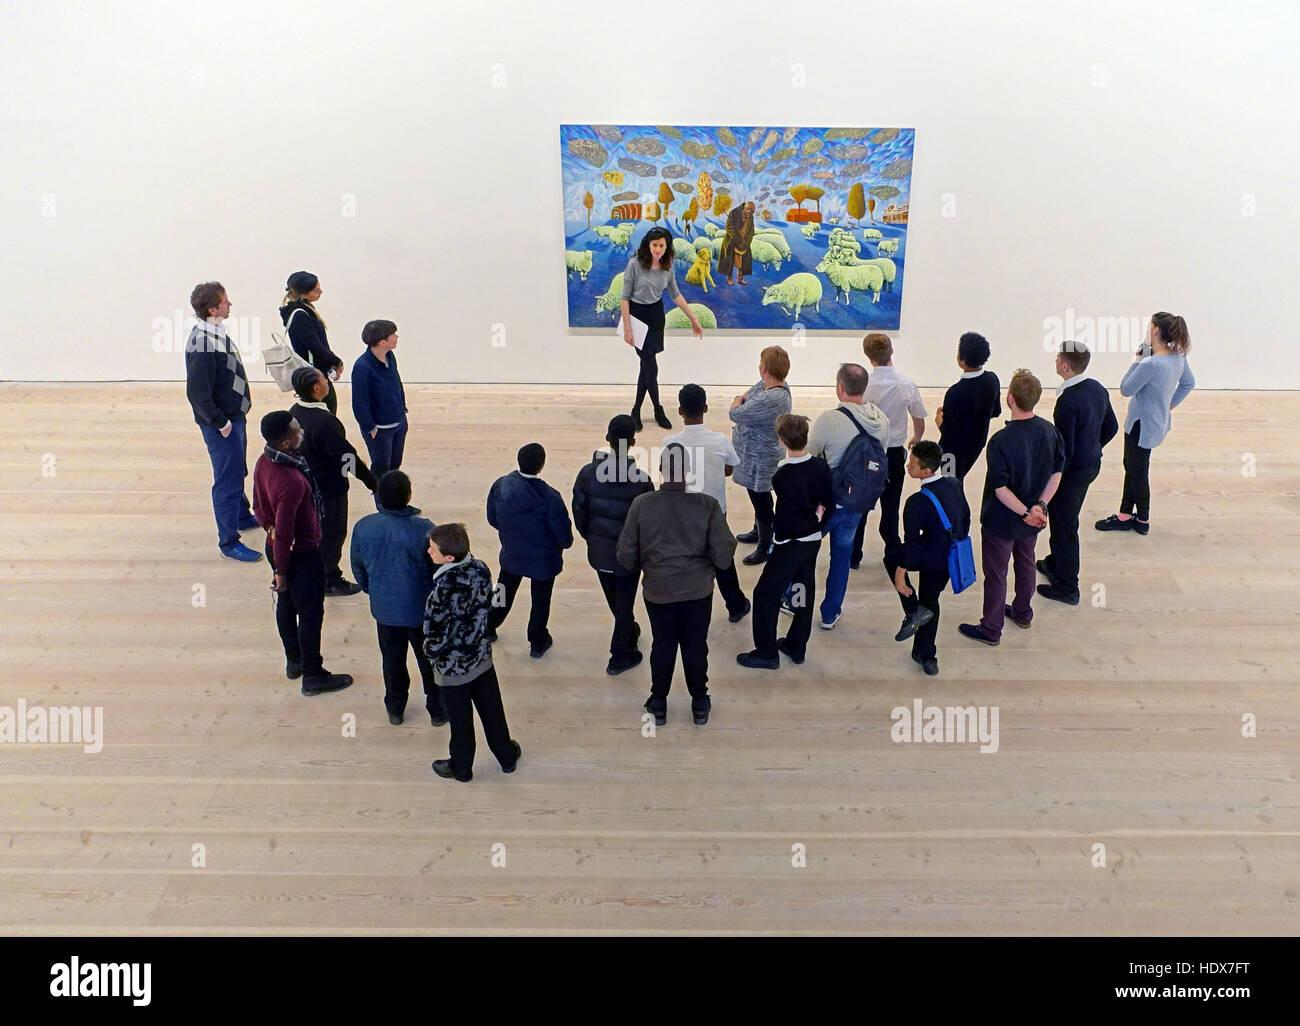 Group of schoolchildren visiting art gallery in London - Stock Image